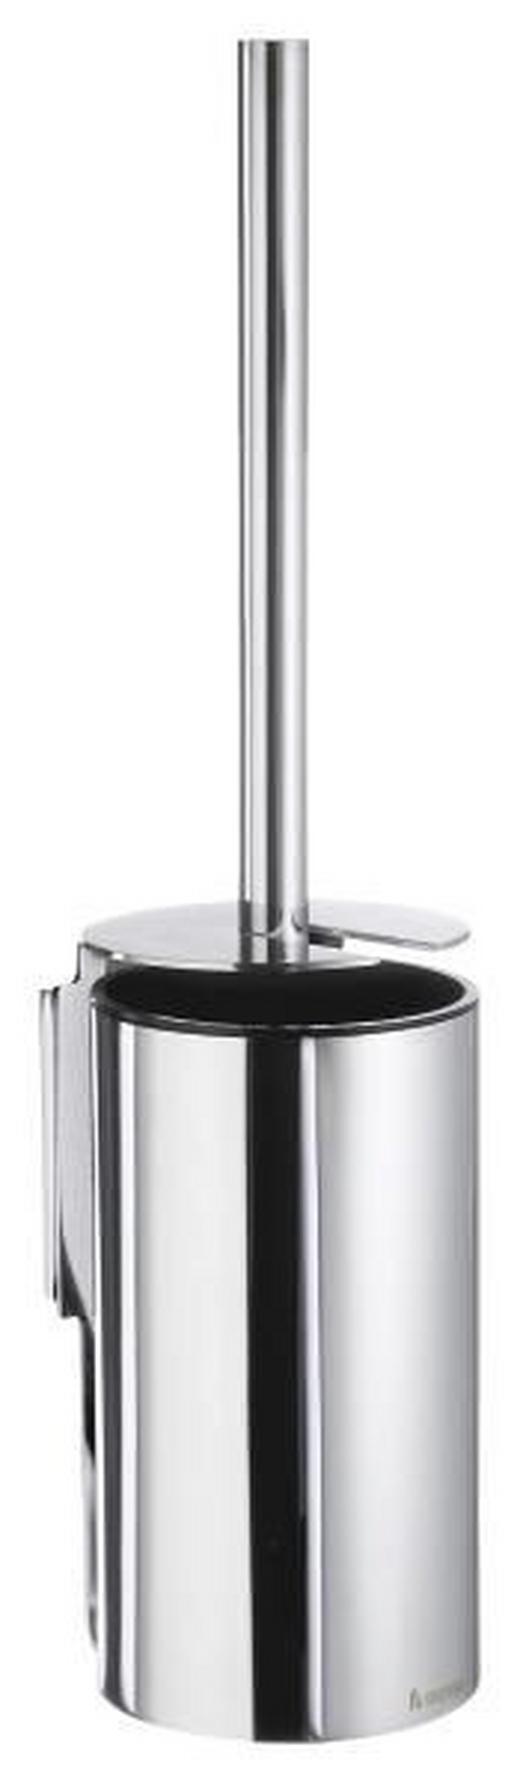 WC-BÜRSTENGARNITUR Kunststoff, Metall - Chromfarben, Basics, Kunststoff/Metall (10,6/44,5/8,9cm)